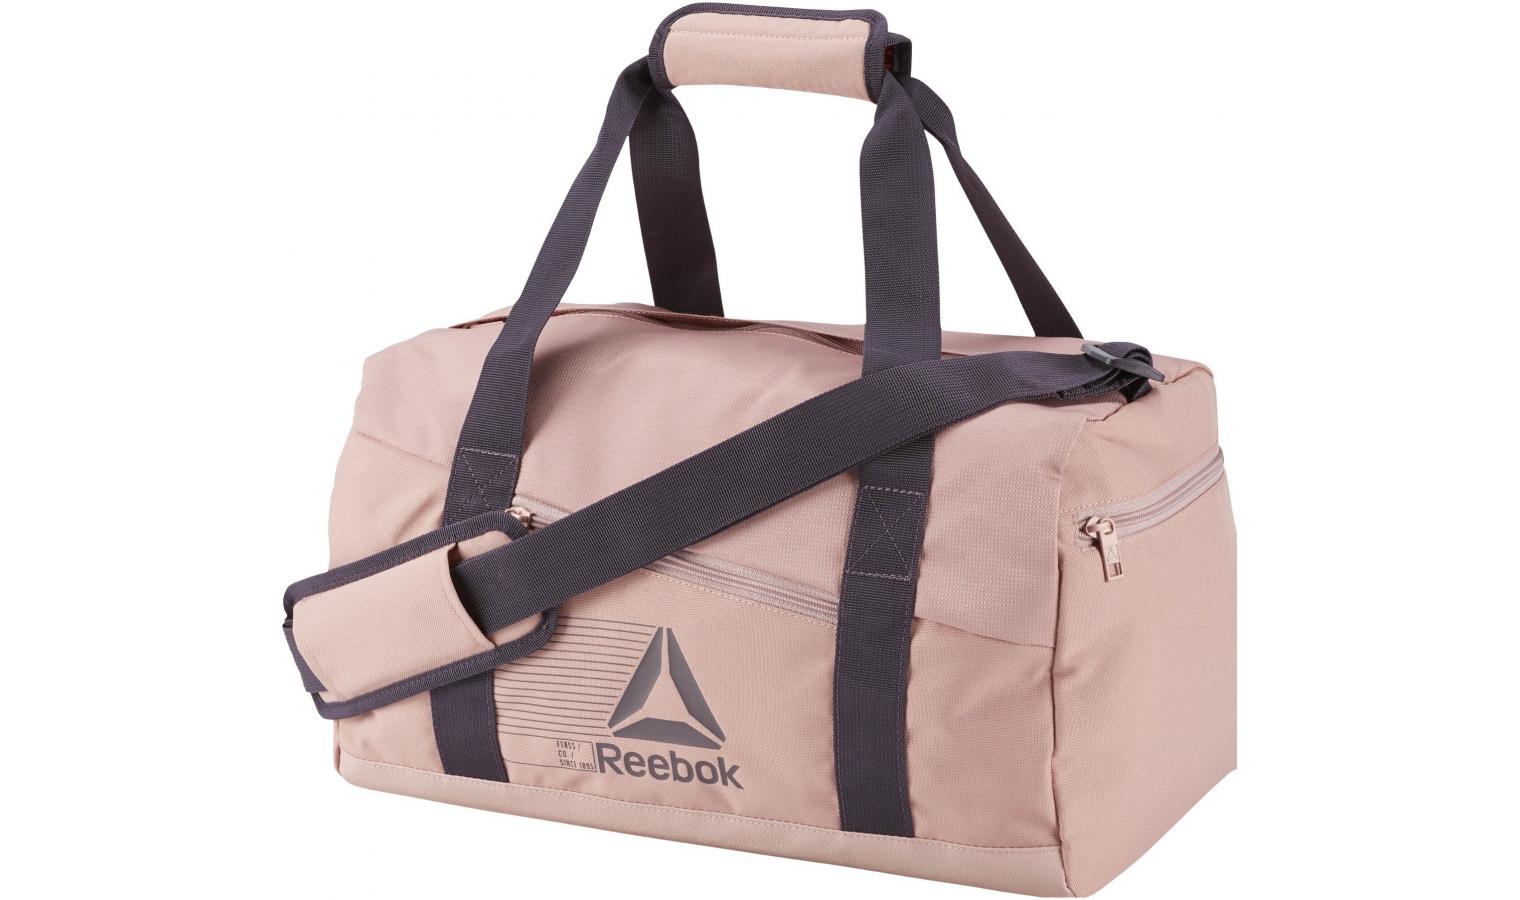 05b742ec6b Dámska športová taška Reebok ACT FON S GRIP ružová